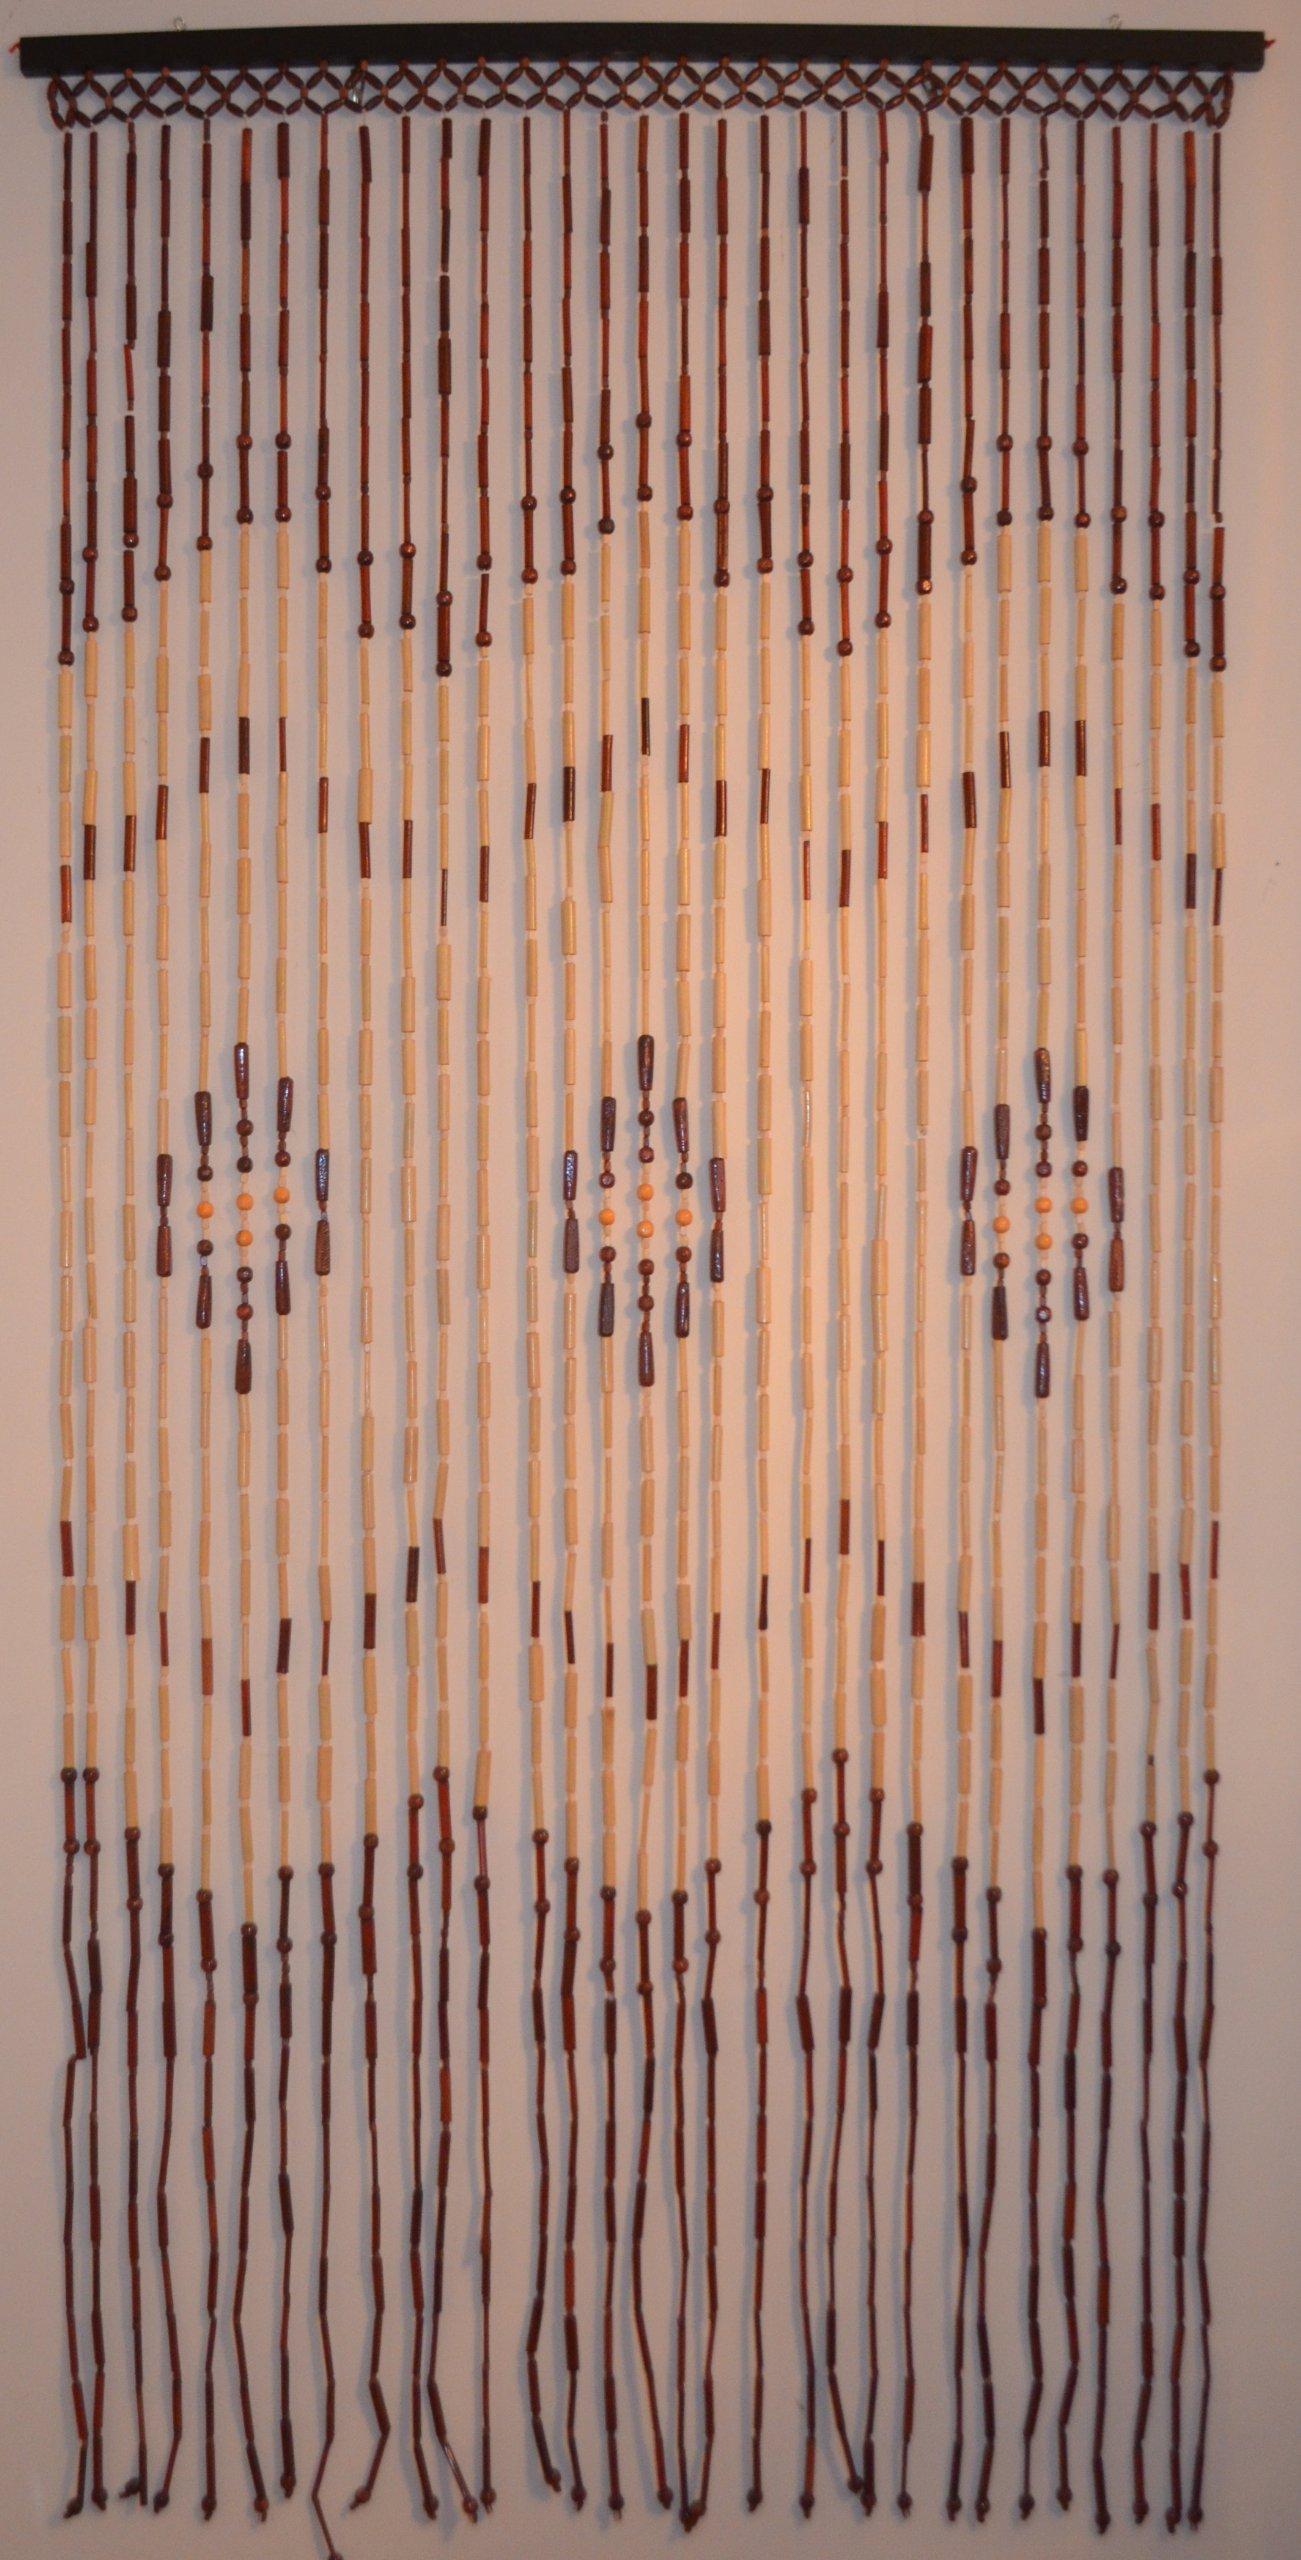 Natural Bamboo & Wood Beaded Curtain, Chevron Pattern , 35.43'' W X 71'' H # 69-803